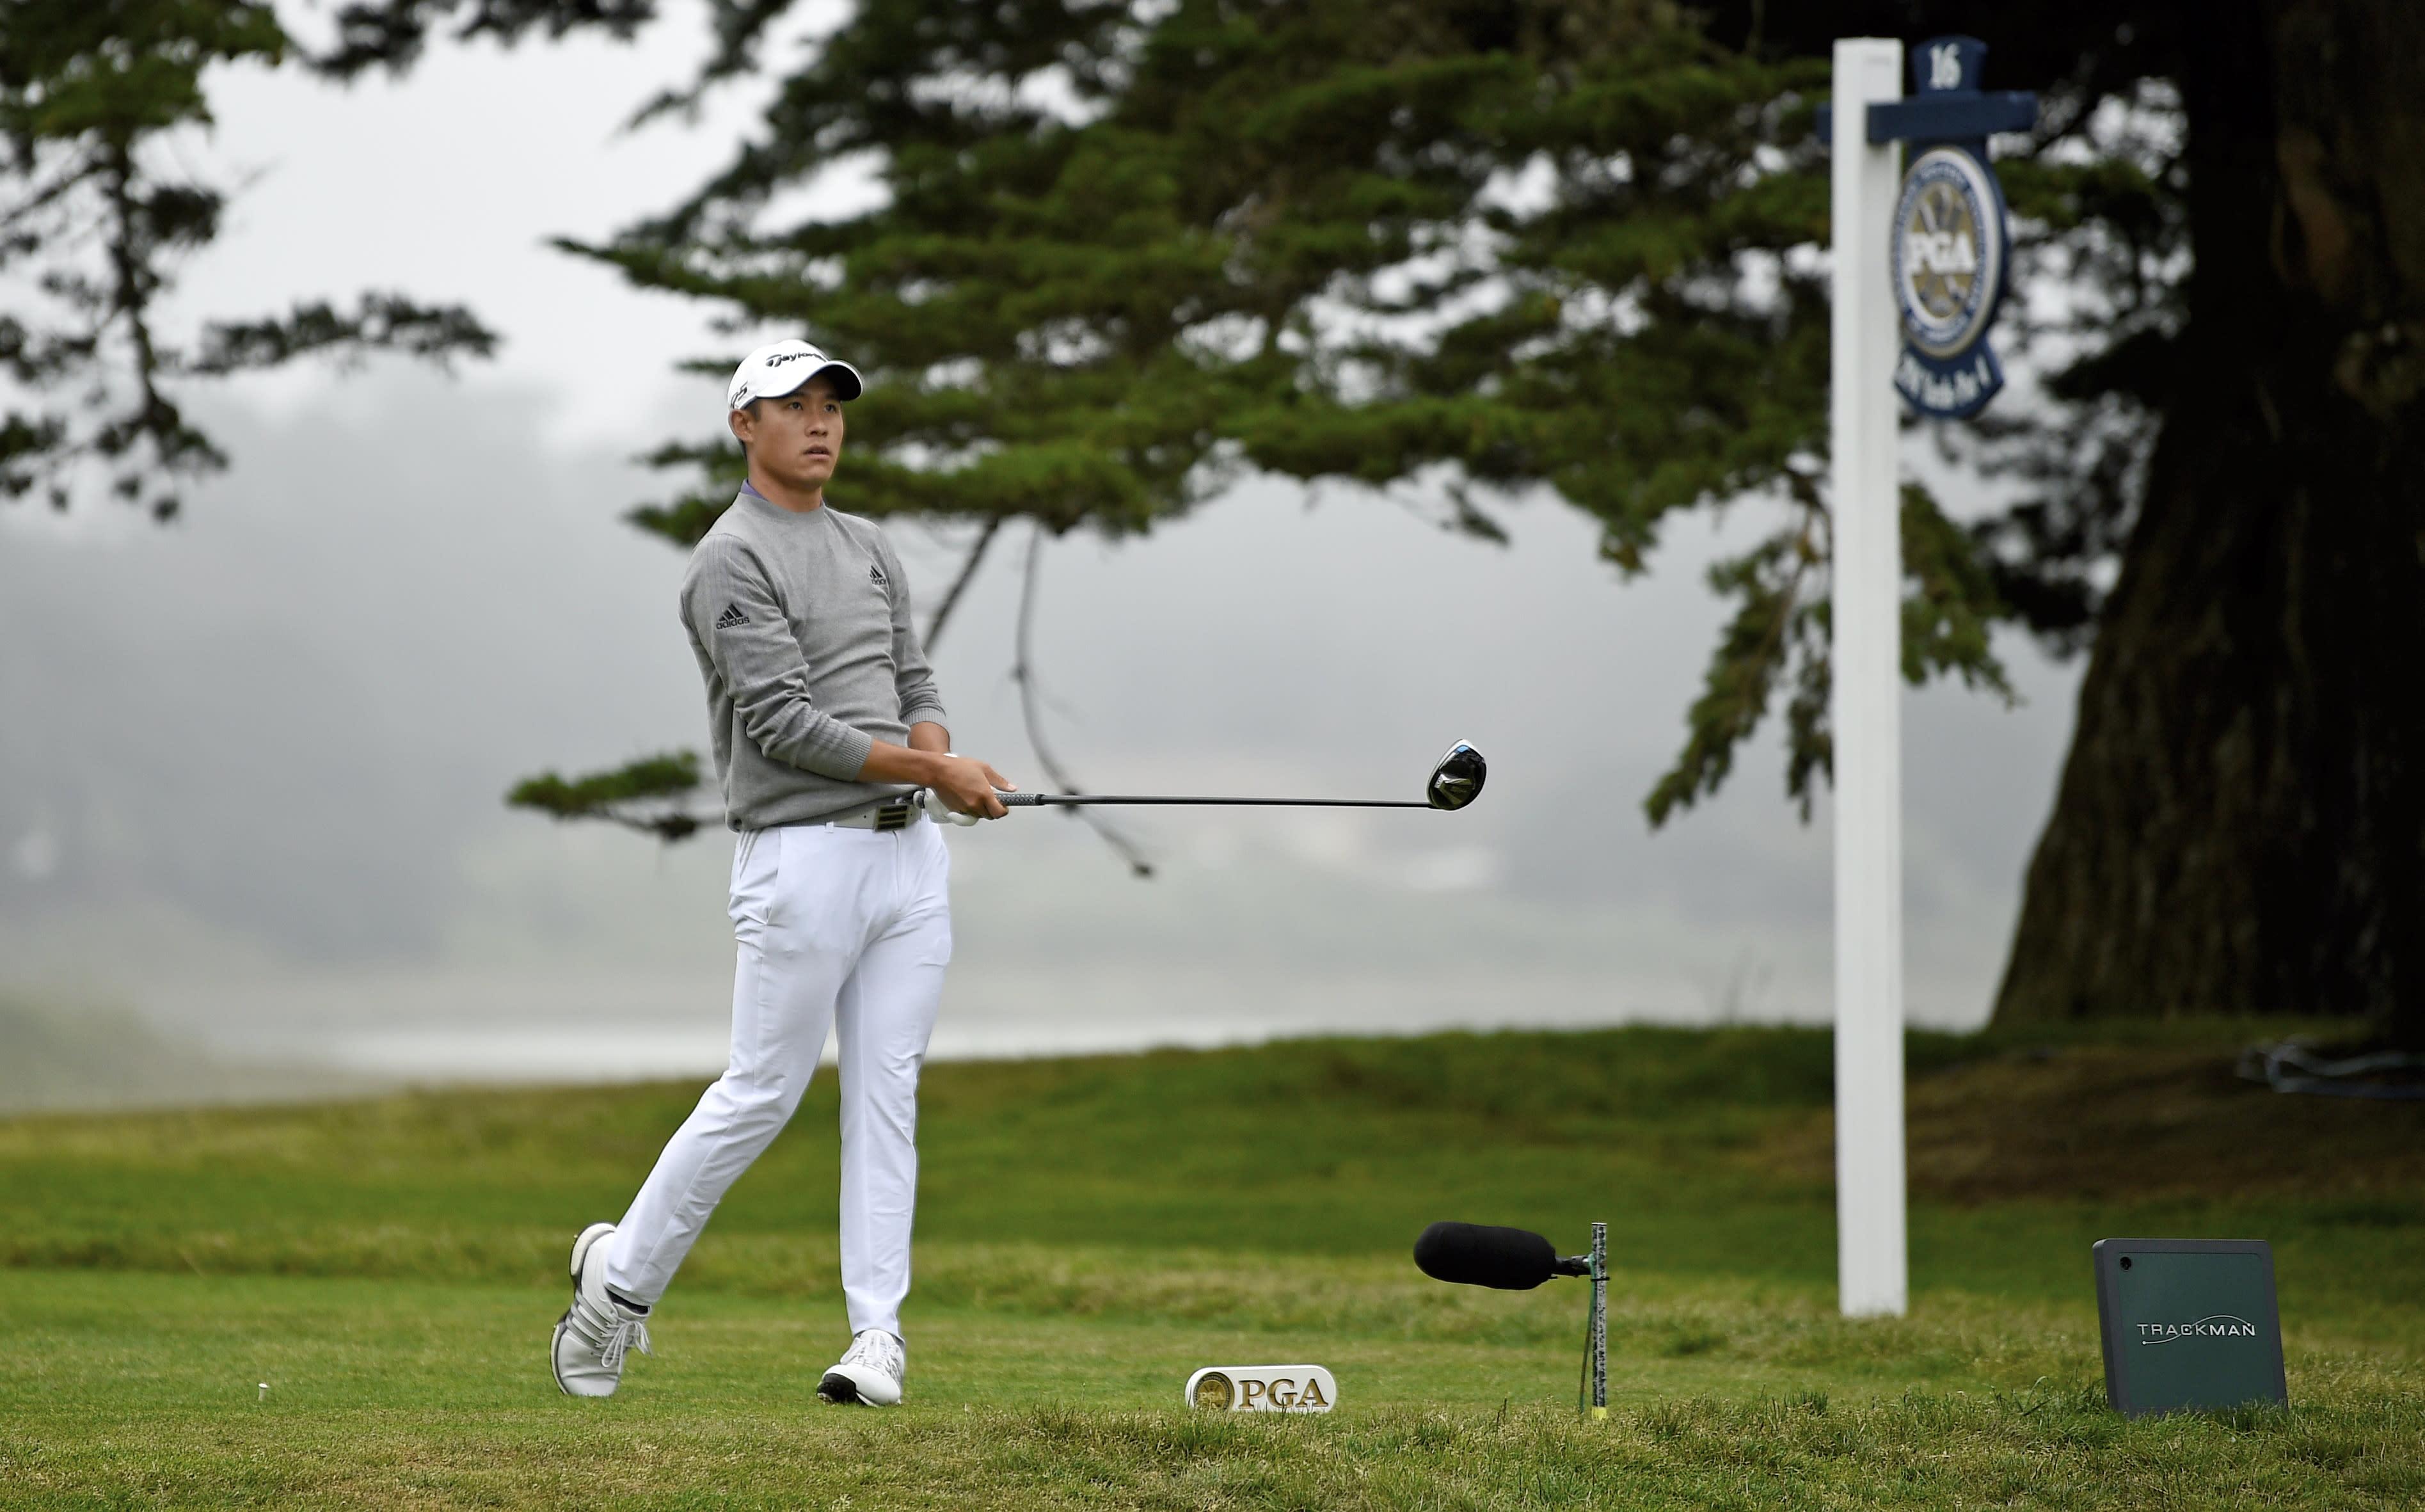 Collin Morikawa on epic shot that led to PGA Championship win: 'Screw it … let's make something happen'